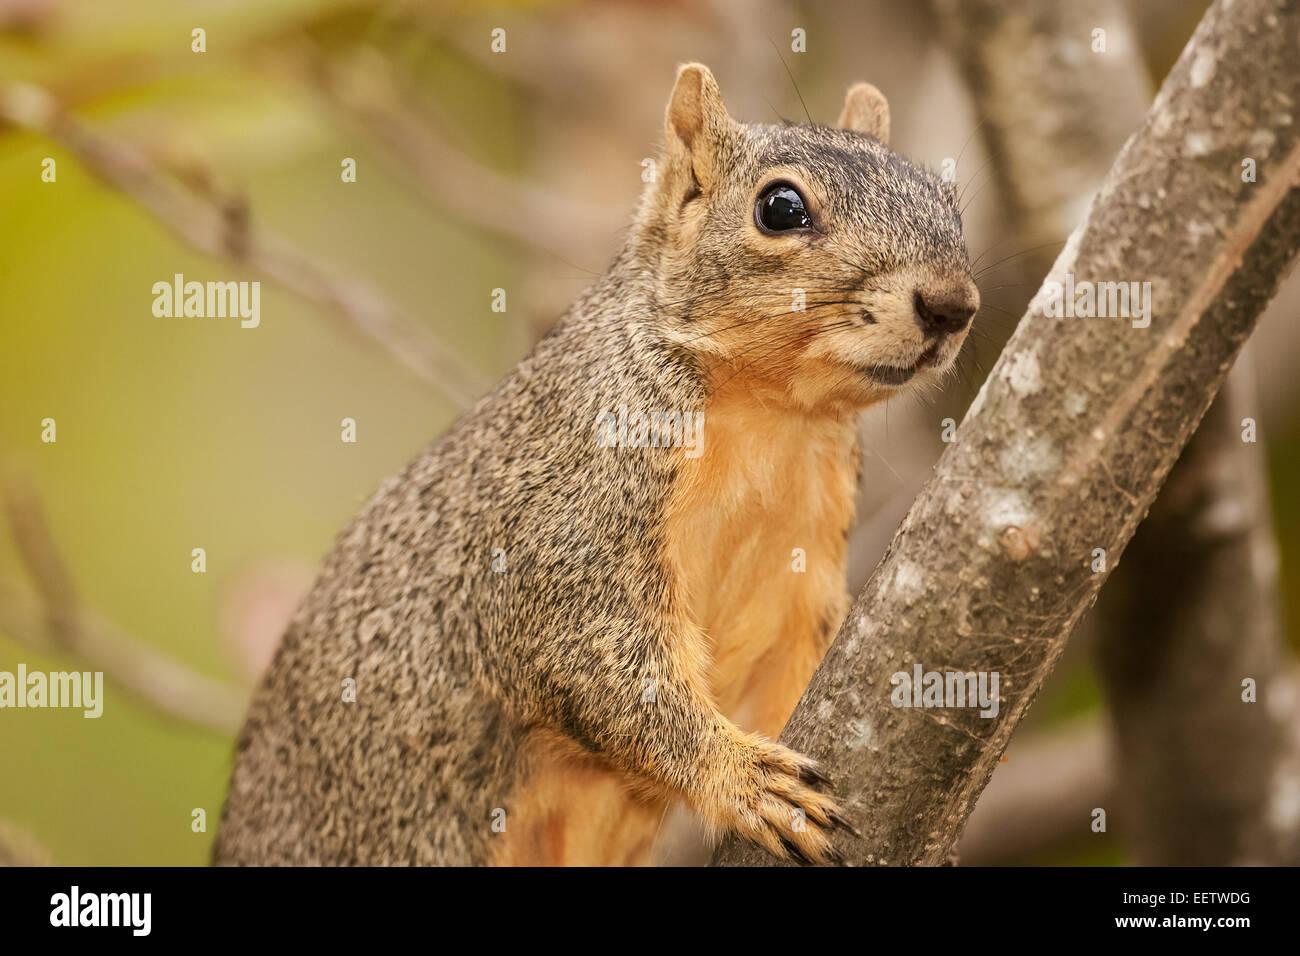 Eastern Fox Squirrel climbing a tree in a backyard in Houston, Texas - Stock Image